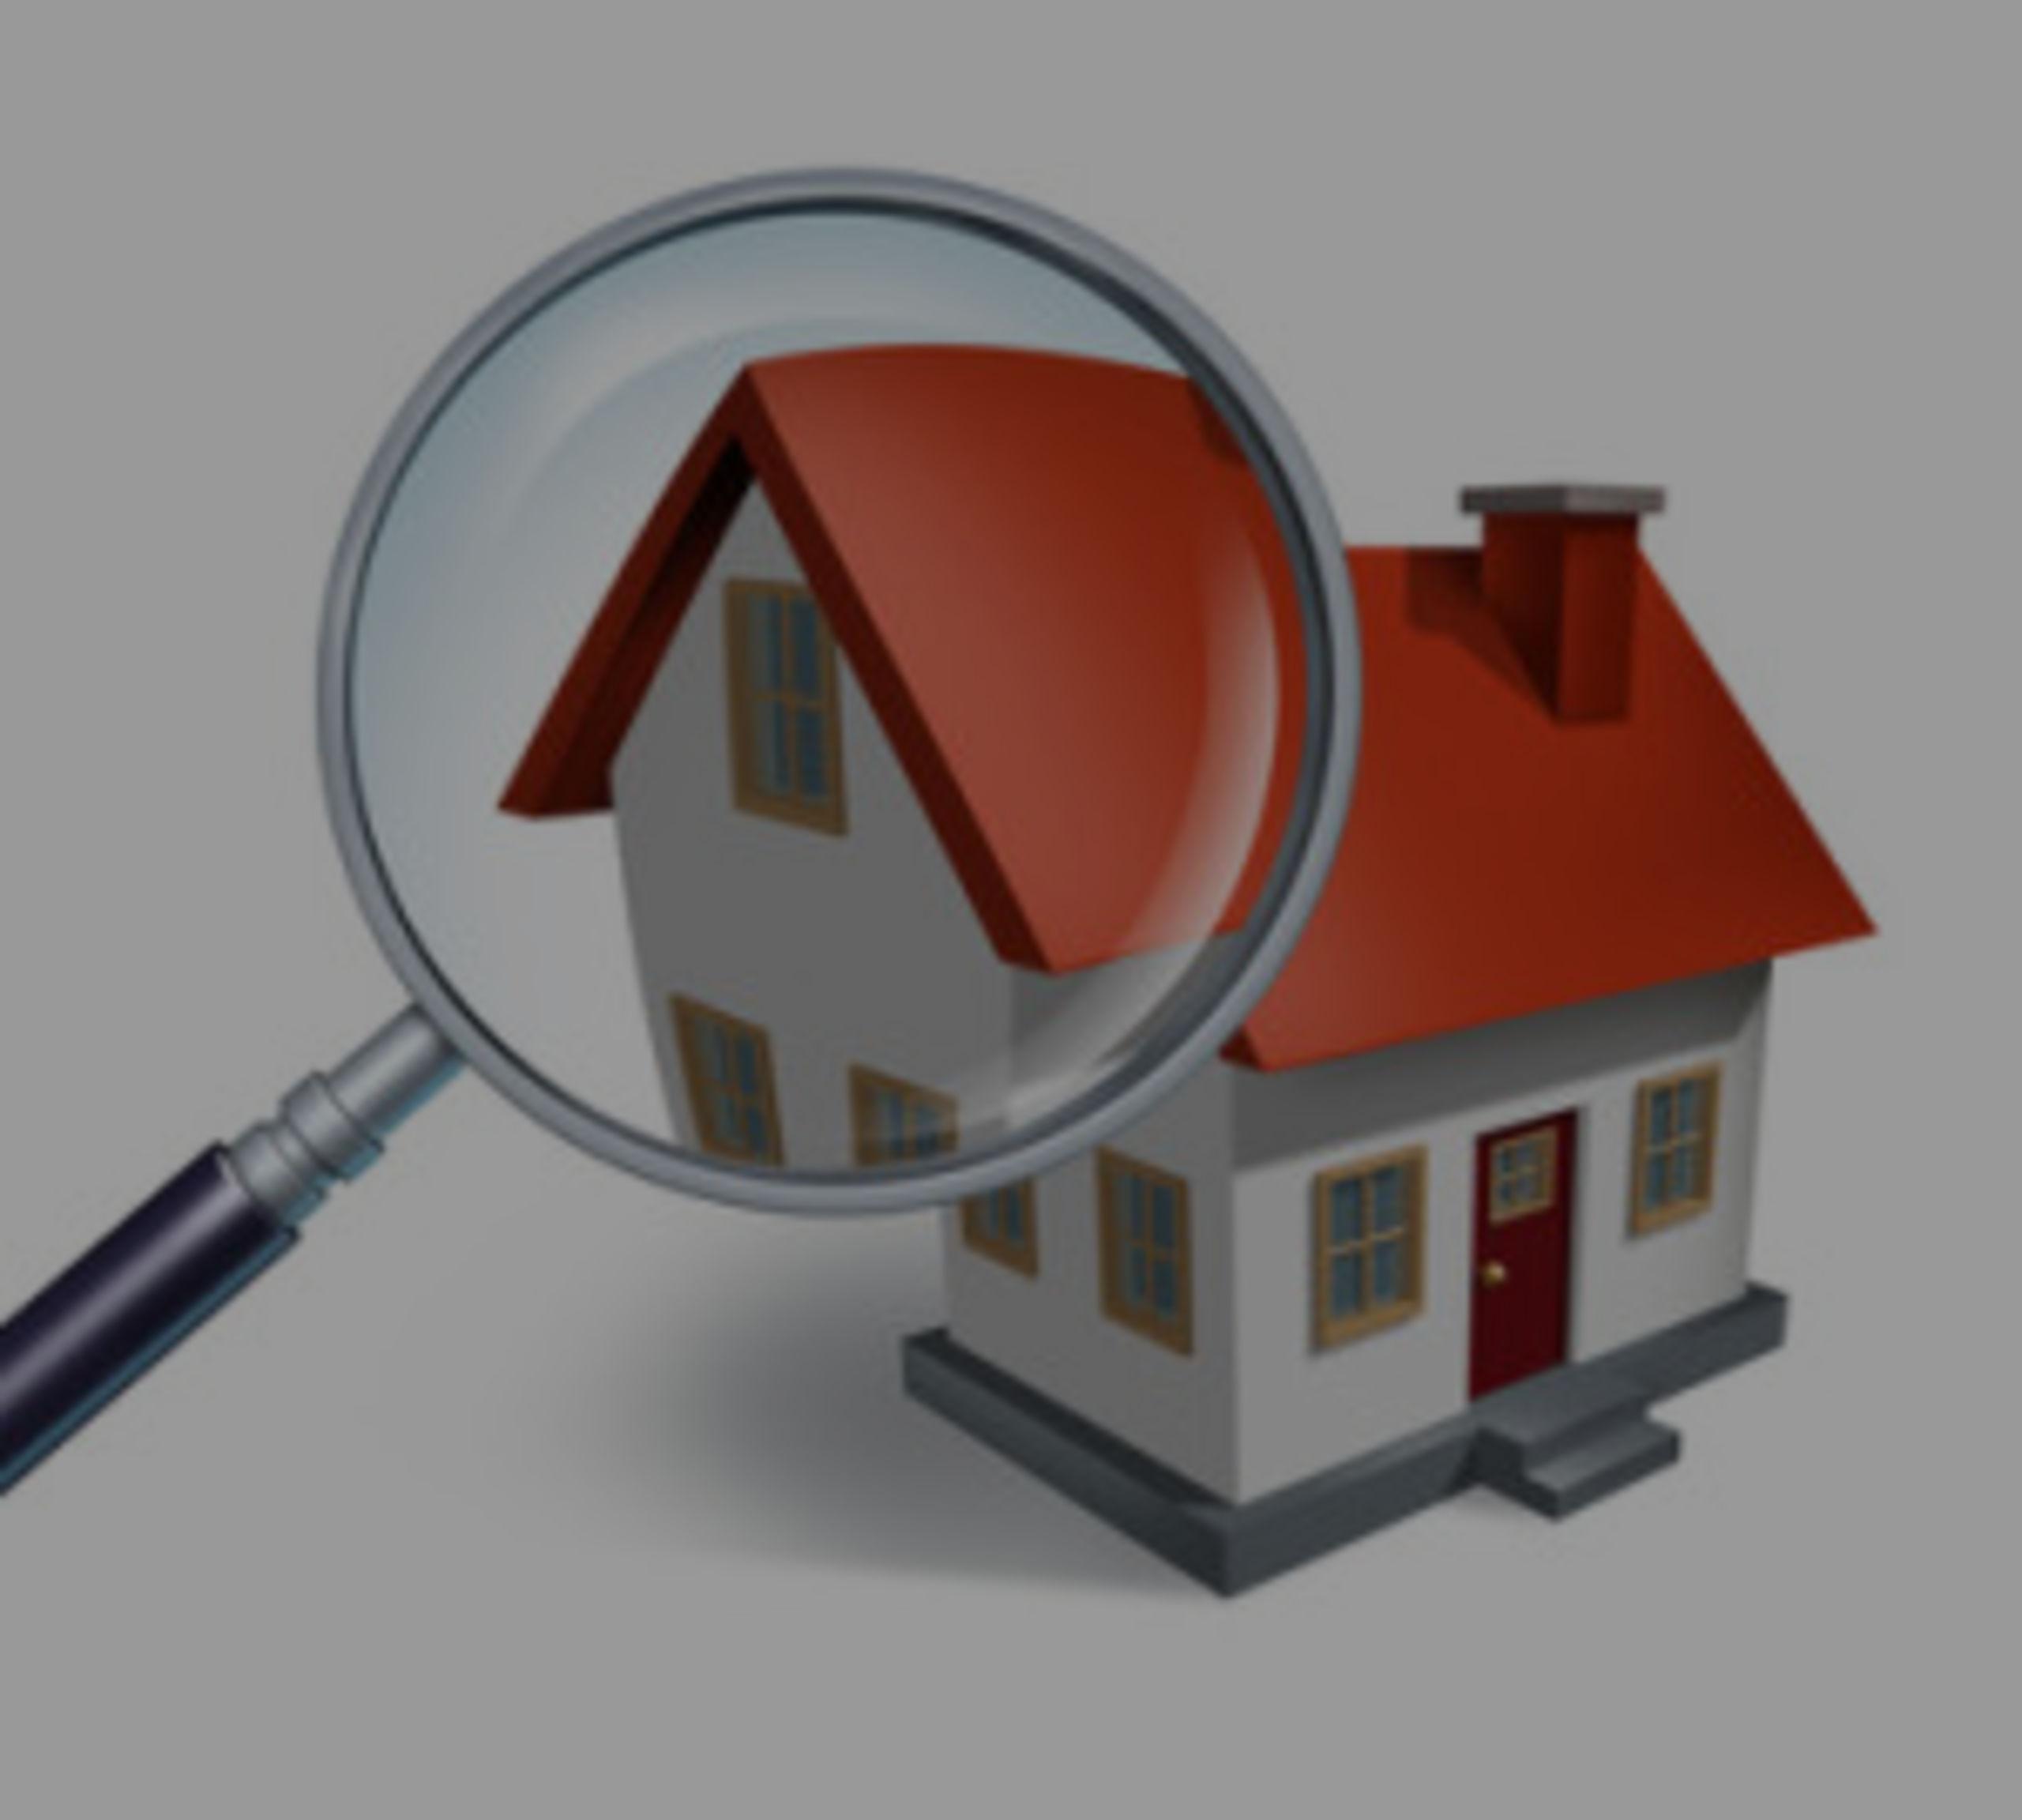 Avoiding Buyer's Remorse